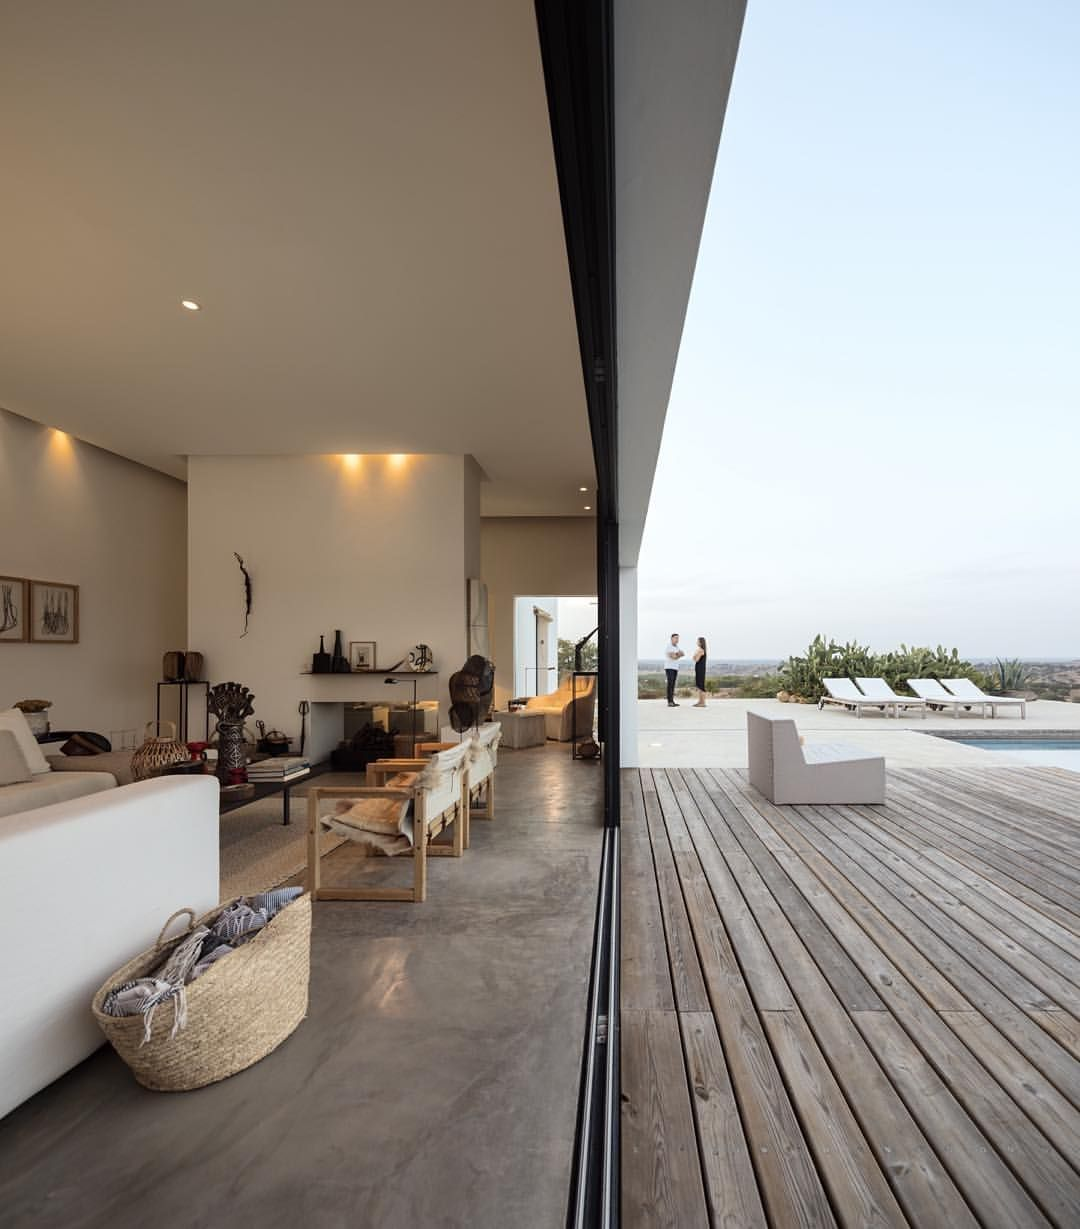 Livingroom Concreteflooring Concretefloor Floormaterial Interior Interiordesign コンクリート 床 床材 リビングルーム インテリア ハウス ハウスデザイン 住宅